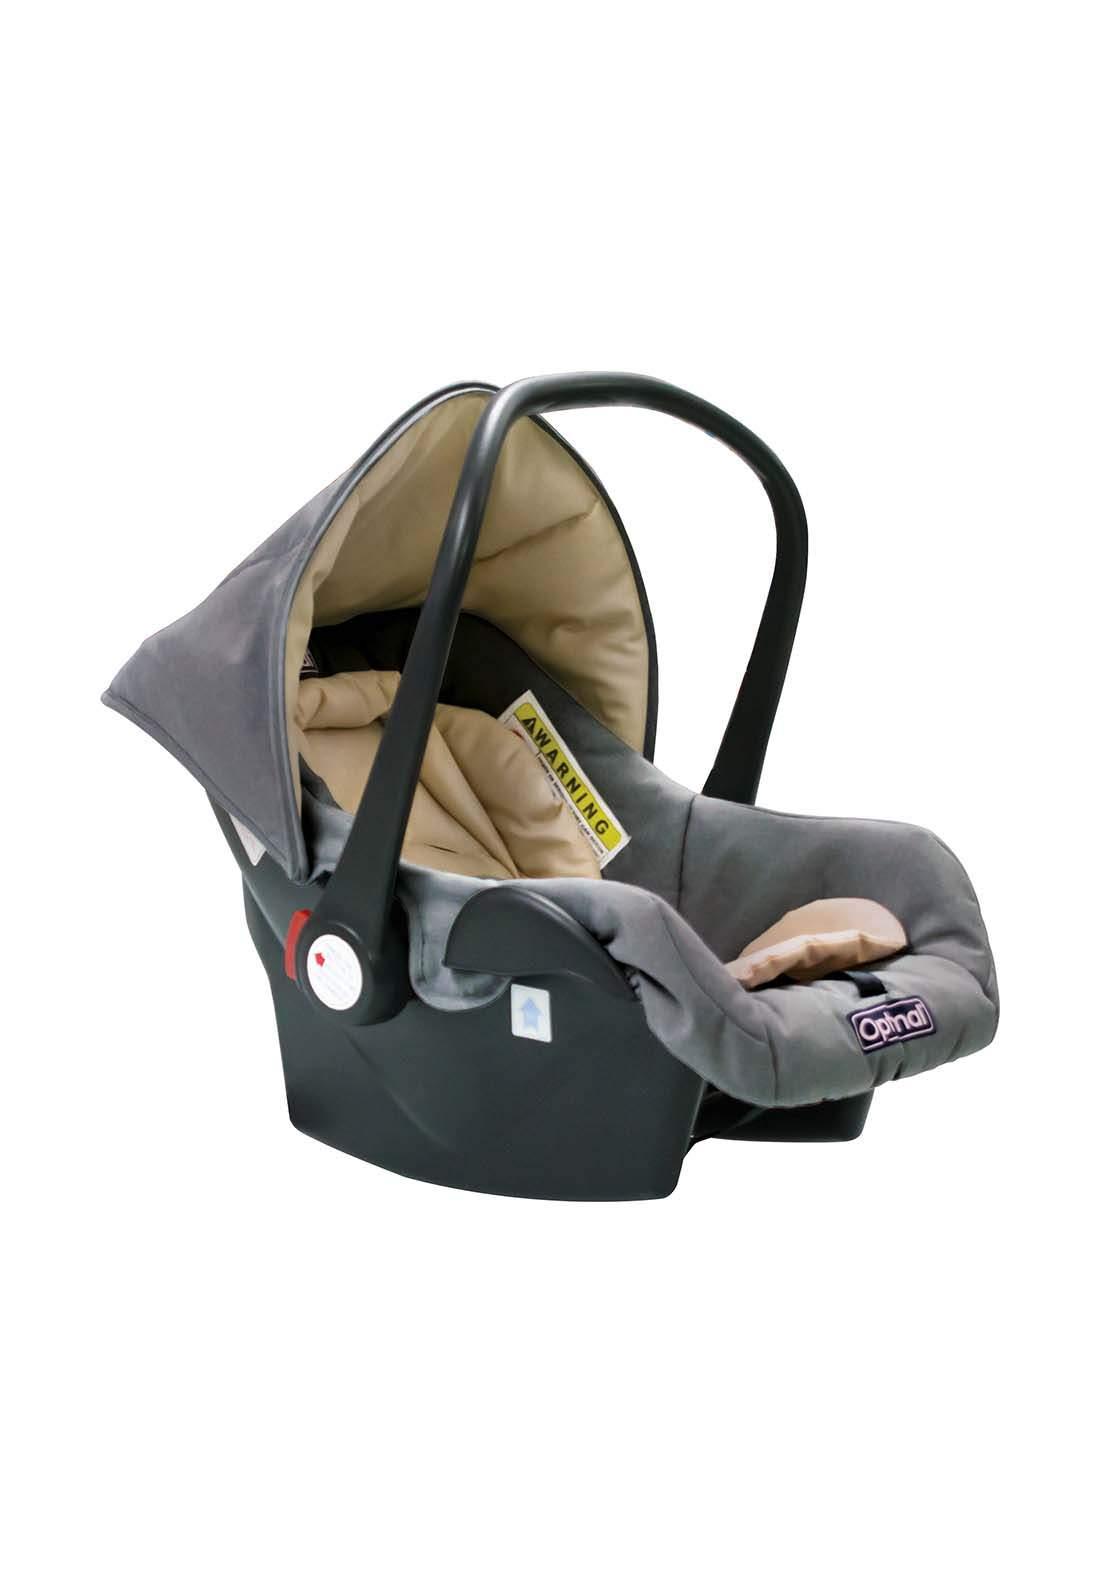 Optimal Infant car seat  مقعد سيارة لحديثي الولادة